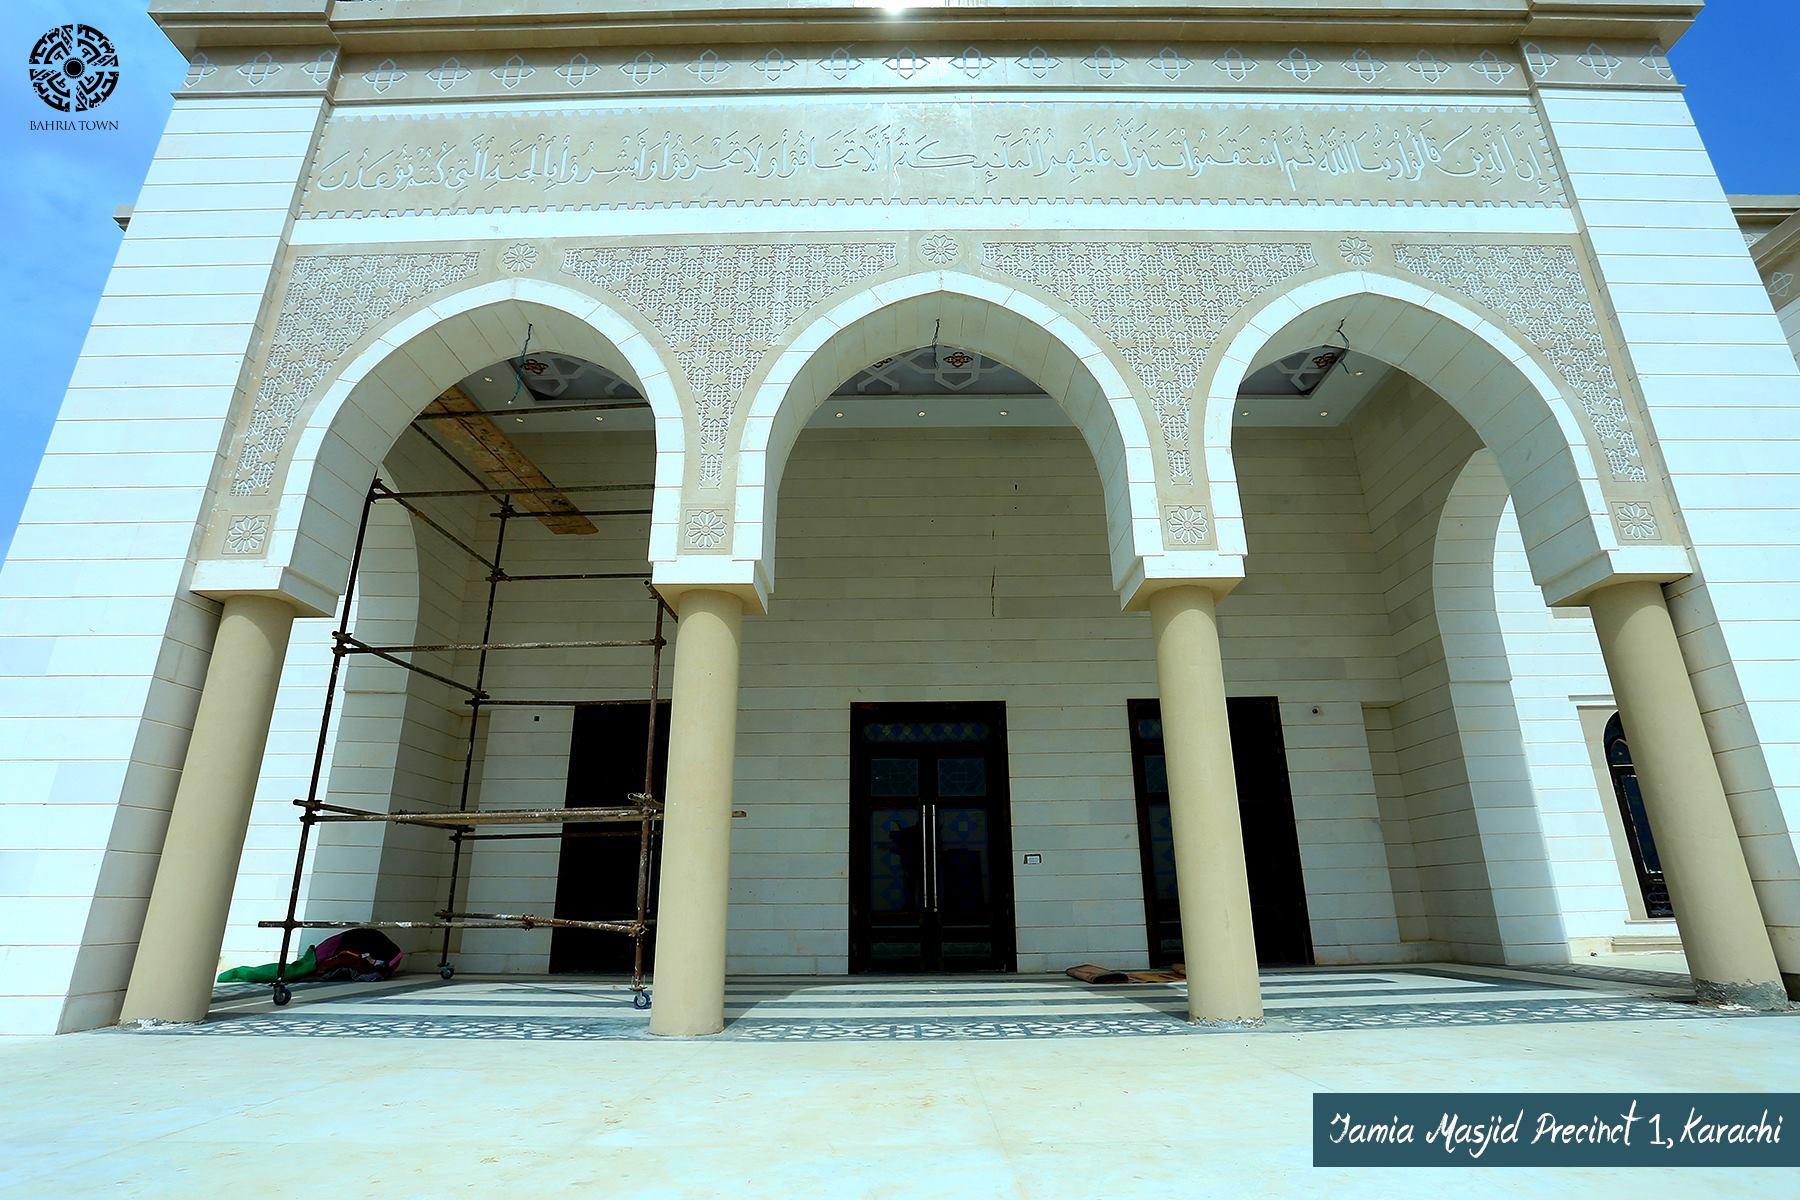 Jamia Masjid – Precinct 1 Bahria Town Karachi3